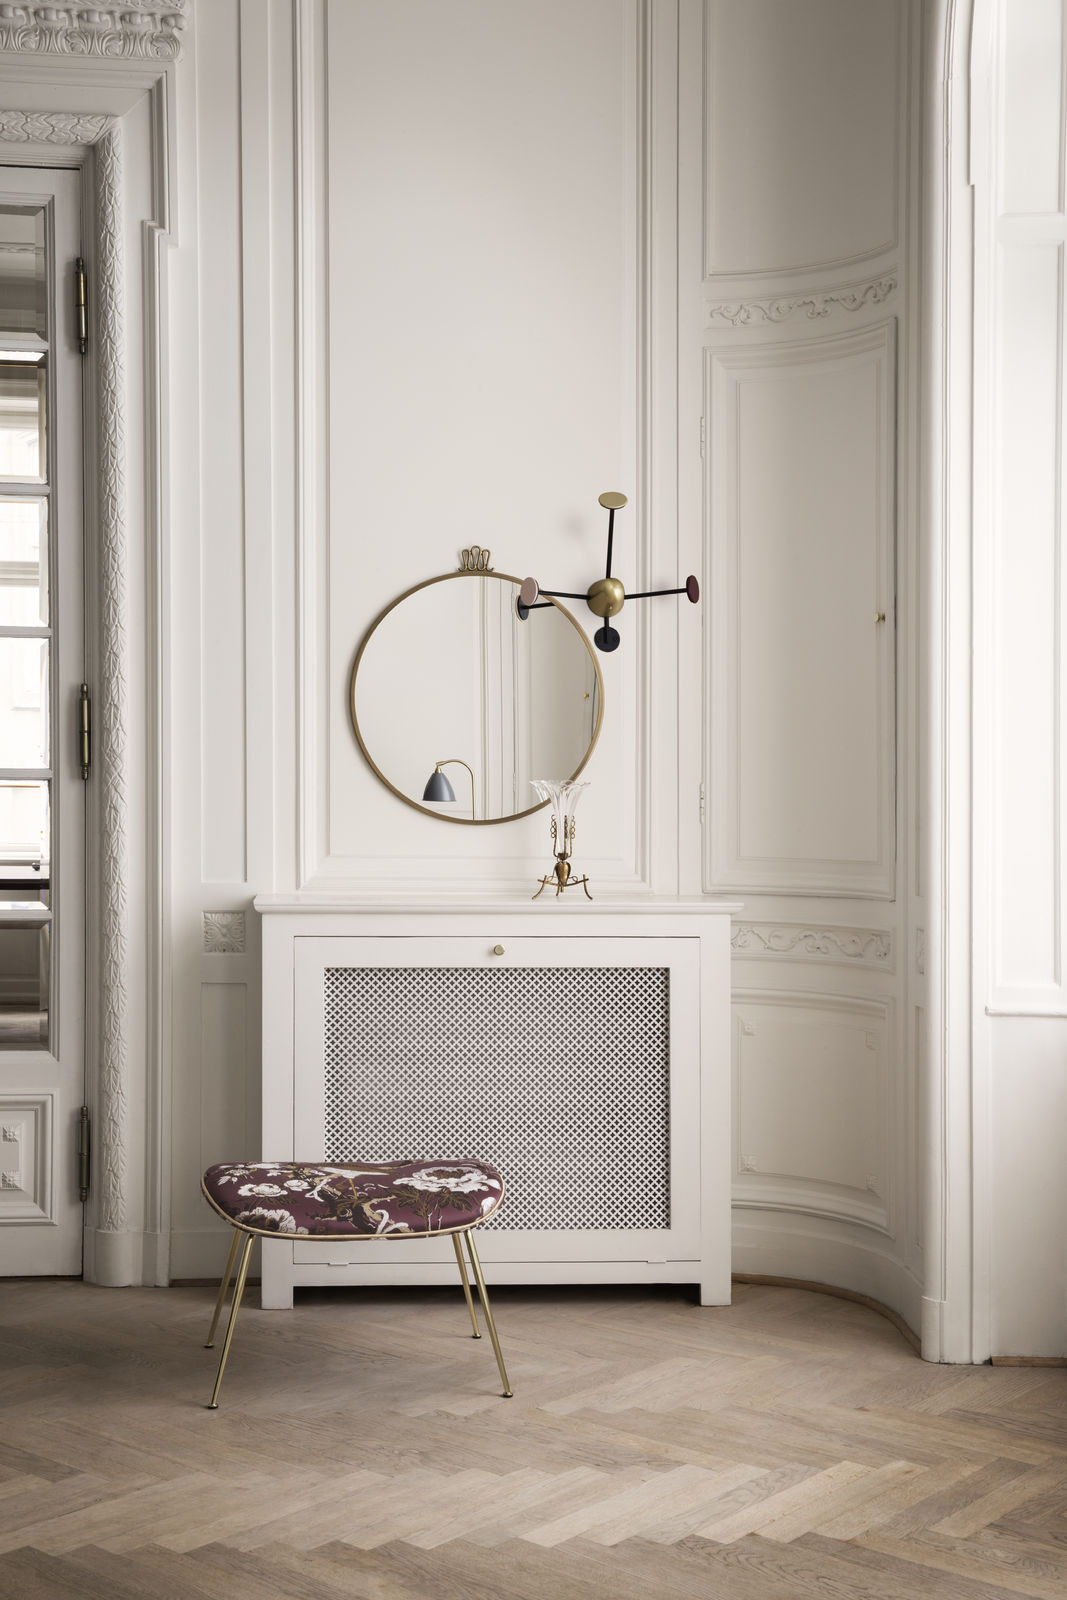 randaccio-mirror_mategot-coat-rack-vintage-red_beetle-footstool-dedar-silkbird-jaquard-t16025002-piping-luce-g06617-1600x1600